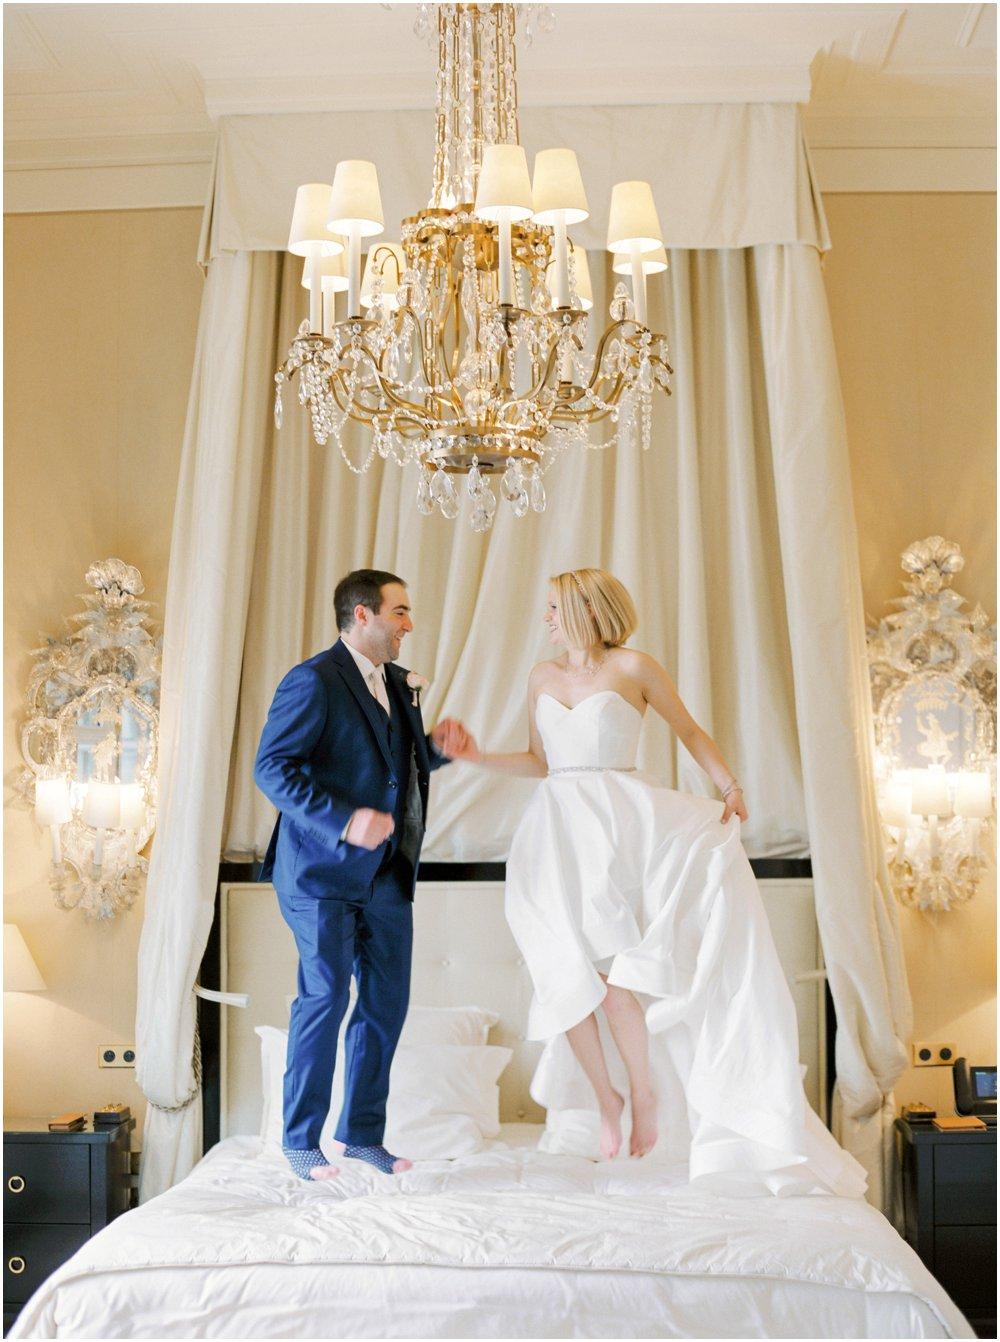 Ritz_Paris_Wedding_RealCouple22.jpg